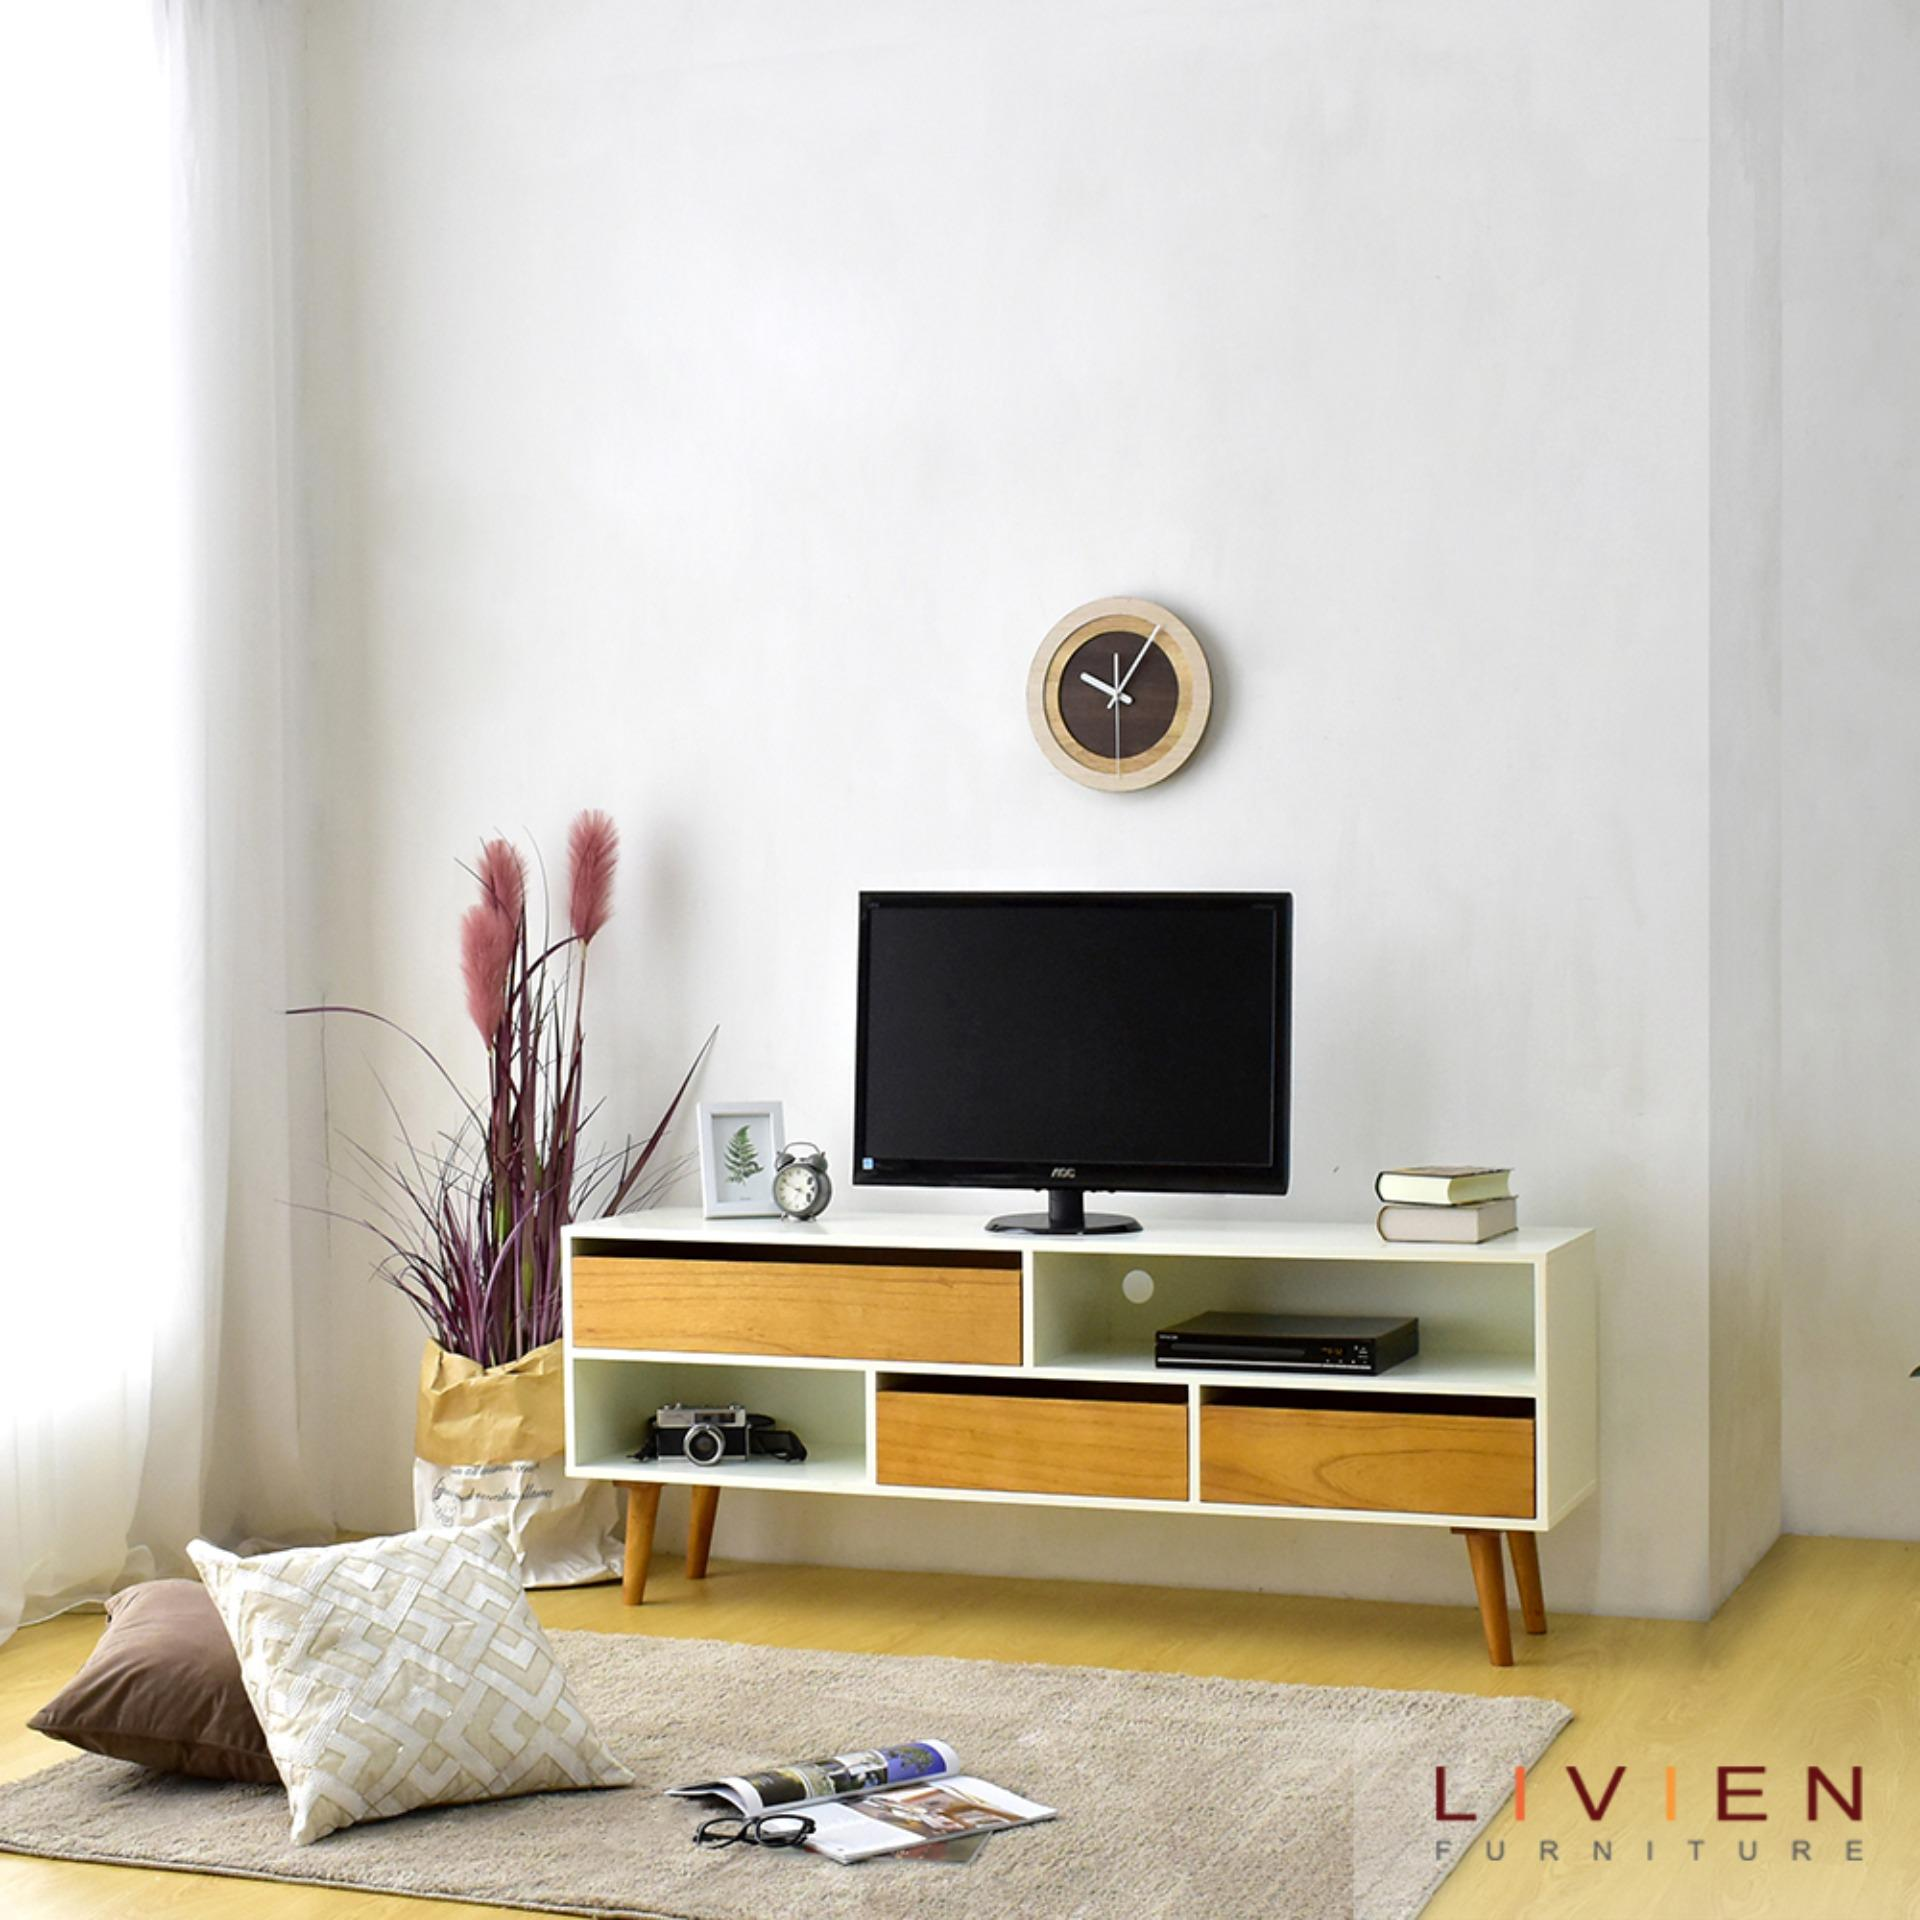 Spek Harga Kirana Furniture BF 828 WO Rak TV - Beige Terbaru. Source · LIVIEN